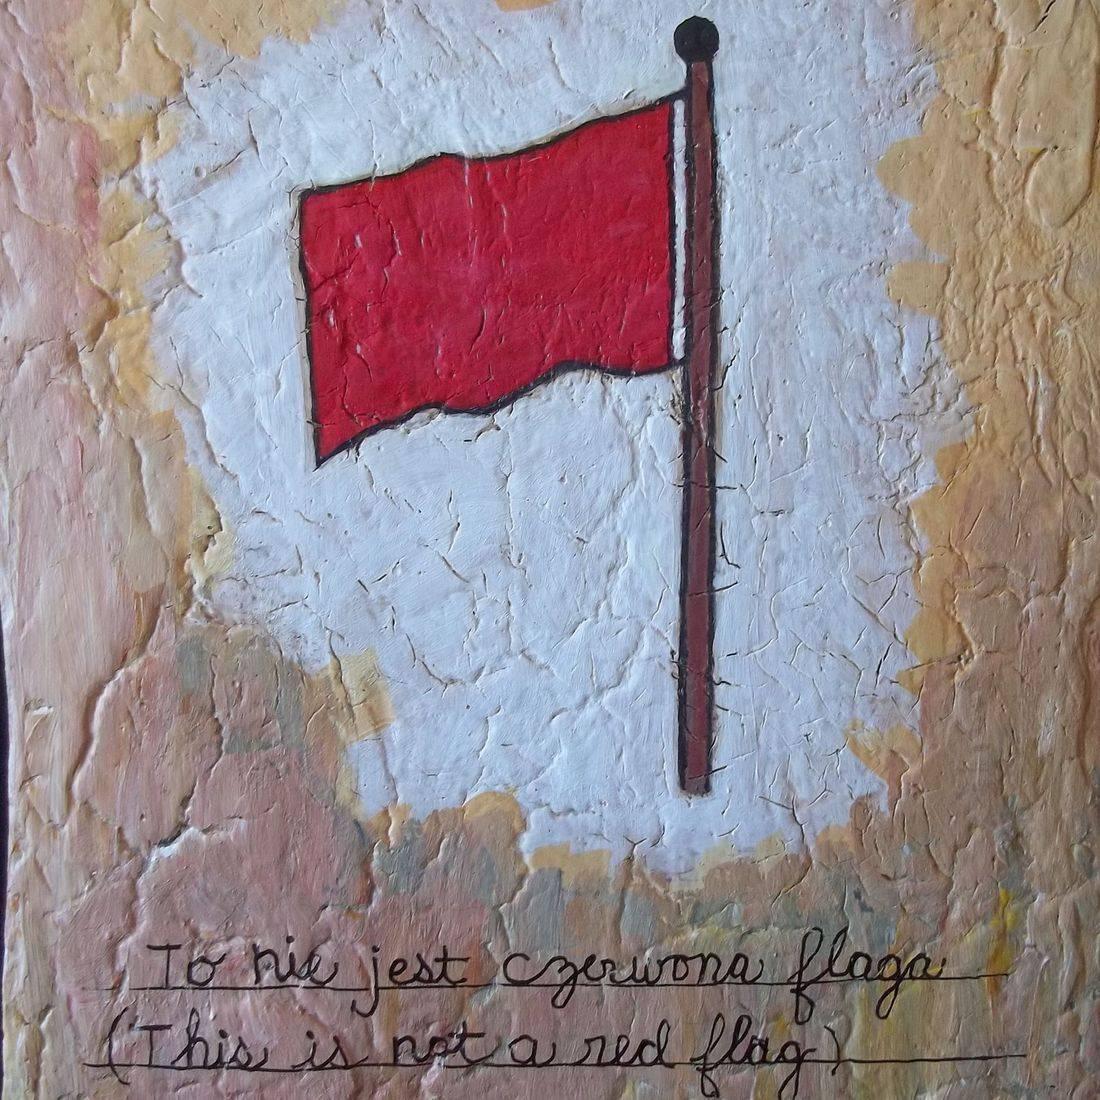 Magritte, Flags, Appropriation Art, Contemporary Art, Surrealism, Pop Art